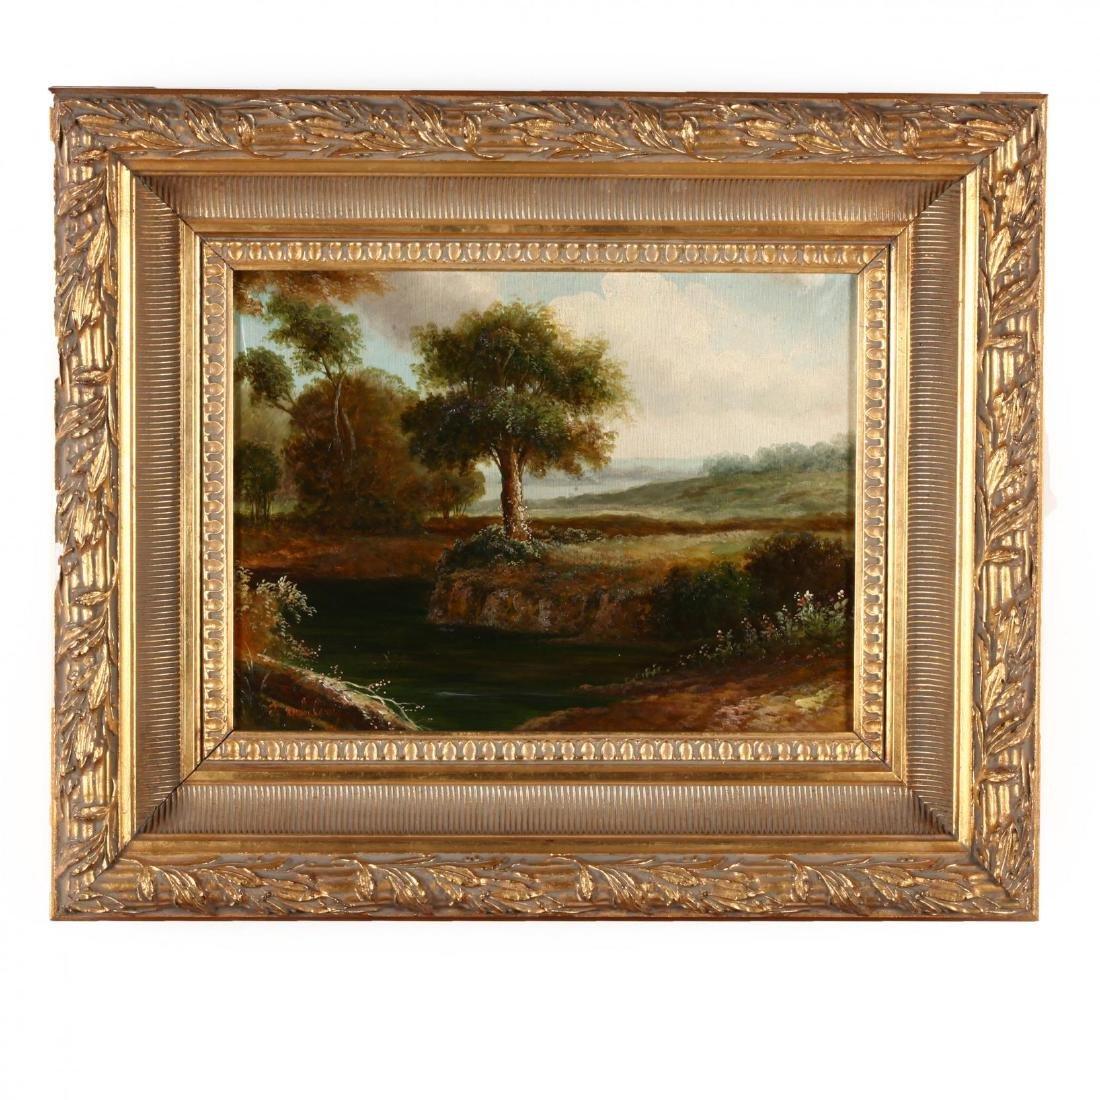 A Pair of Antique Style Decorative Landscape Paintings - 2